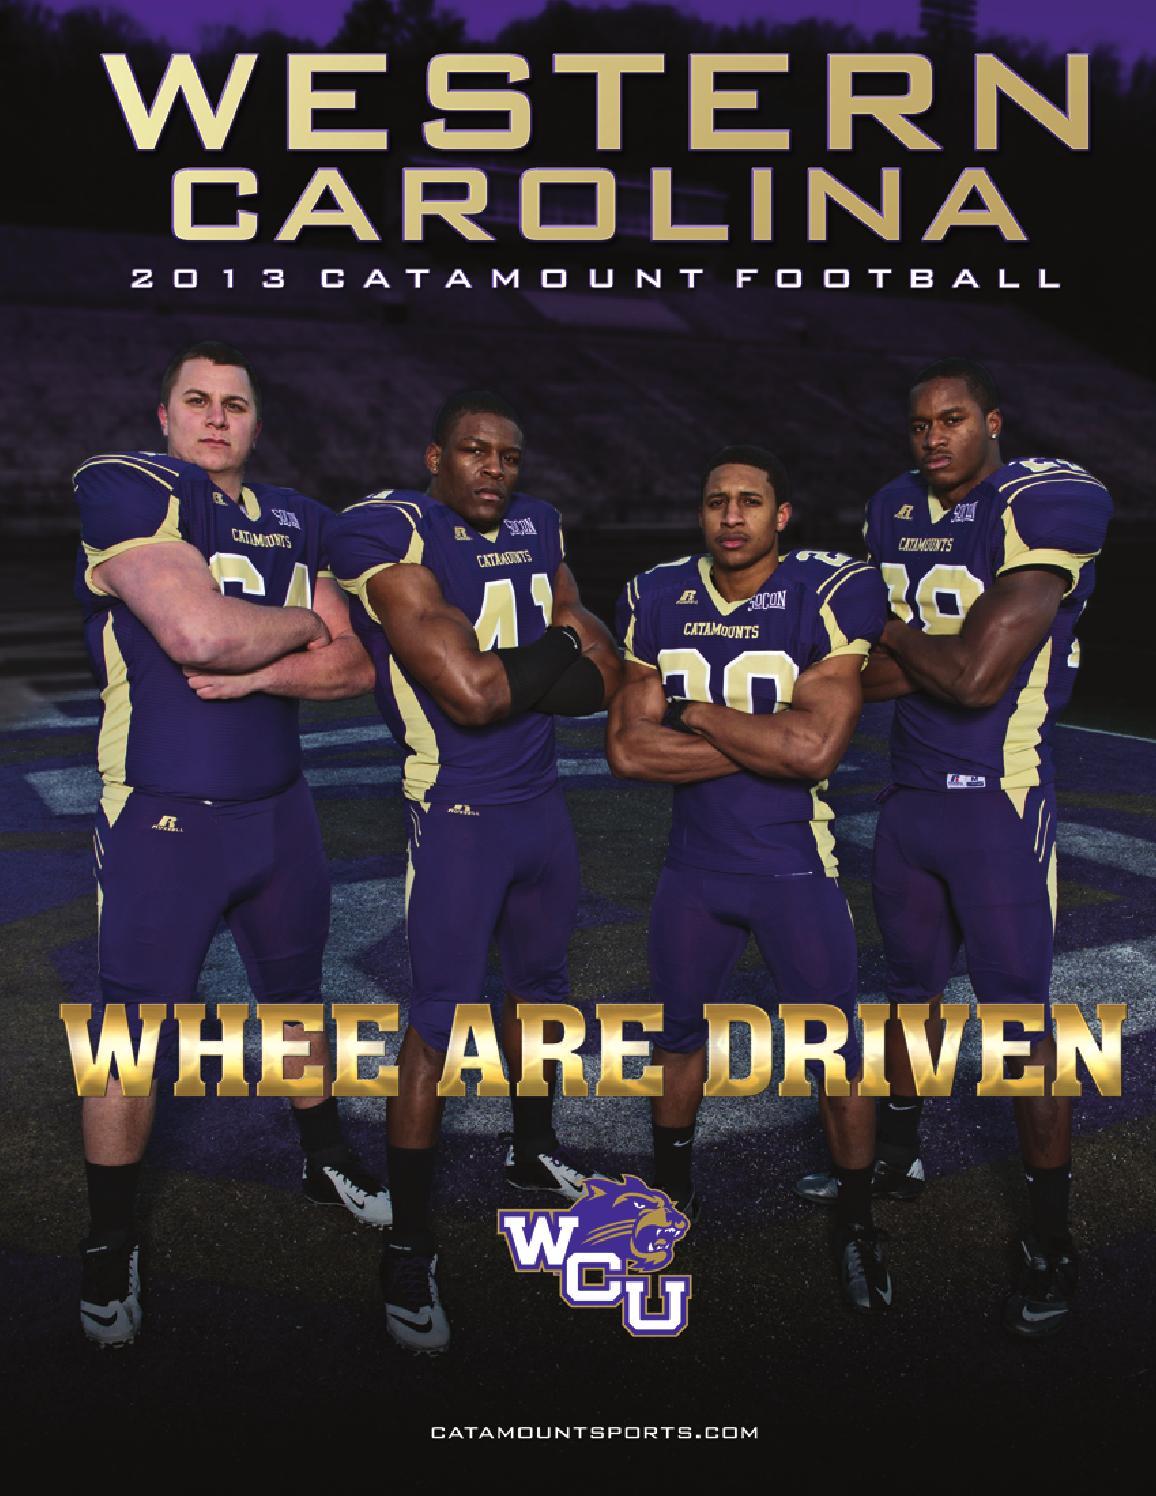 f5df22739 2013 Western Carolina Football Yearbook by Western Carolina University  Athletics - issuu